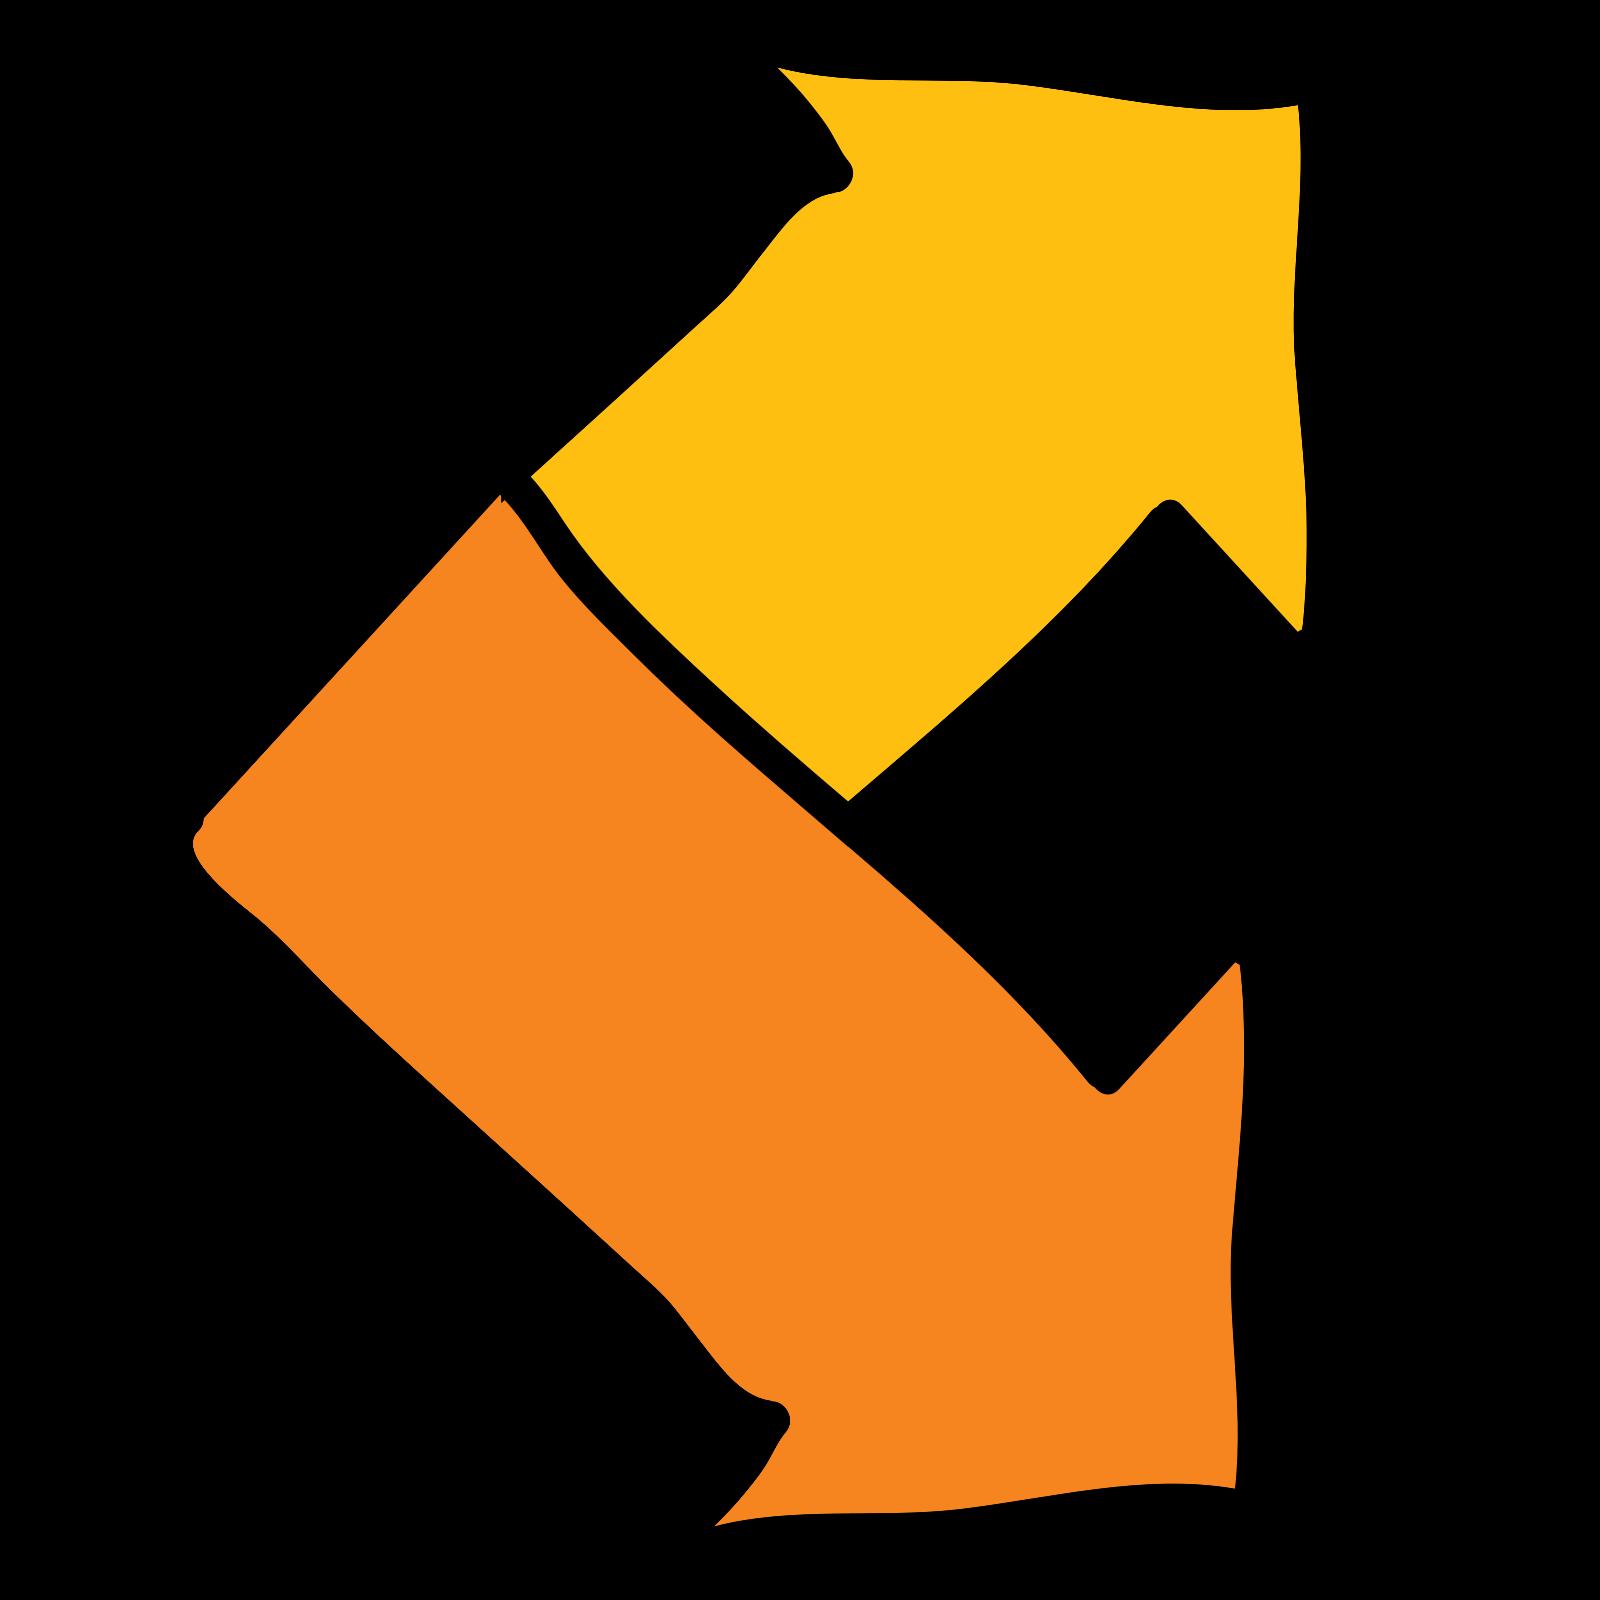 Up Down Right Arrow Arrows icon